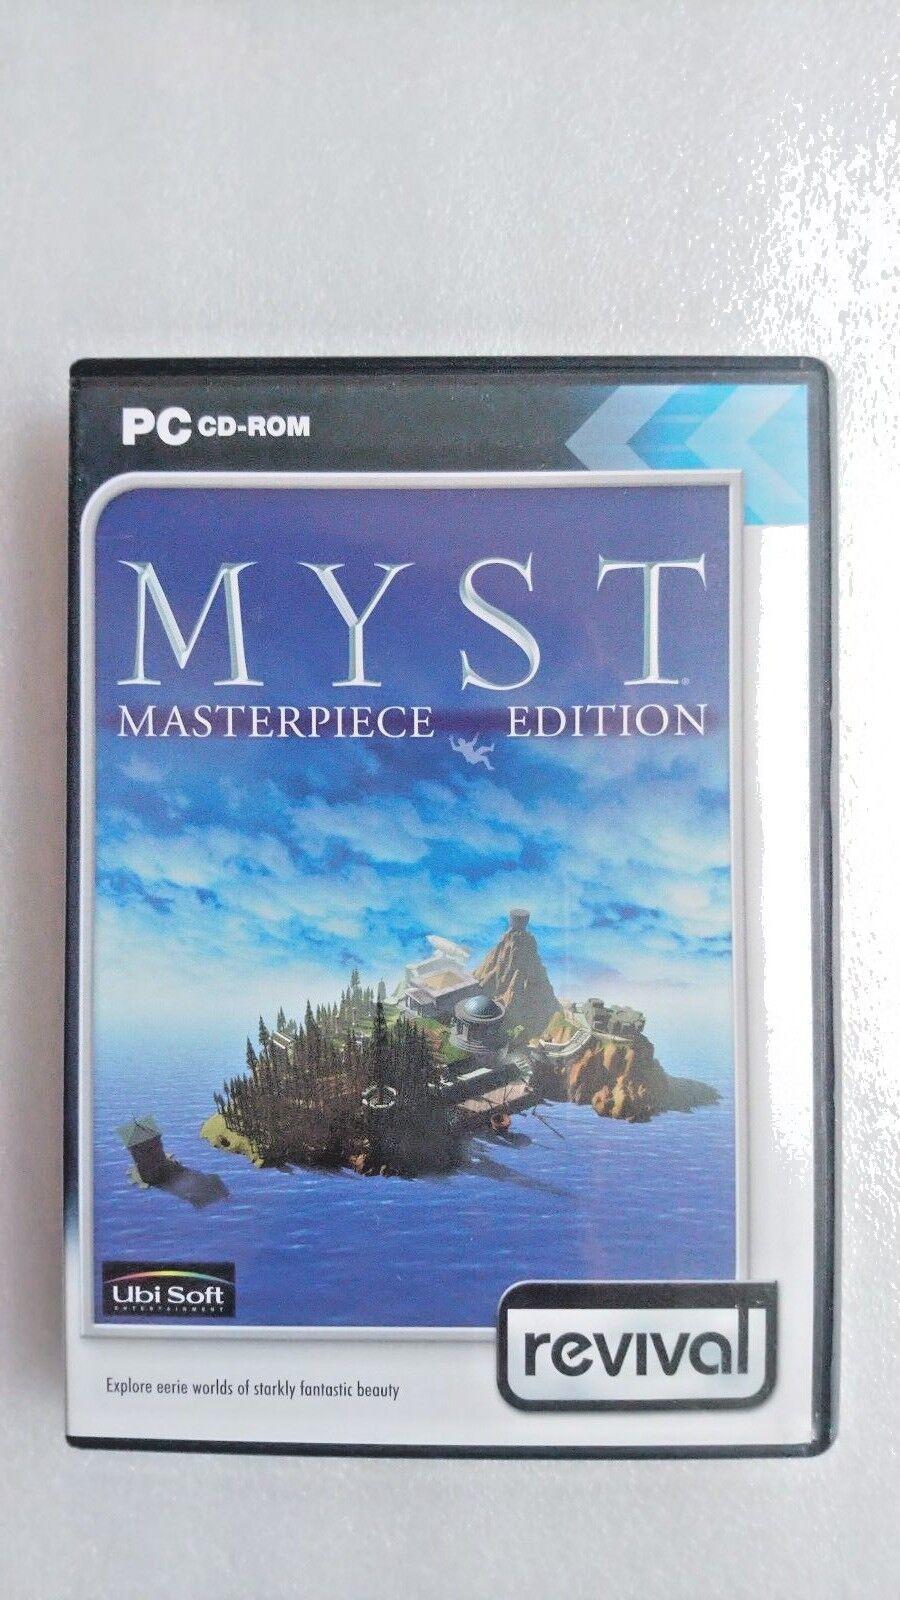 Myst: Masterpiece Edition (PC: Windows, 2003)